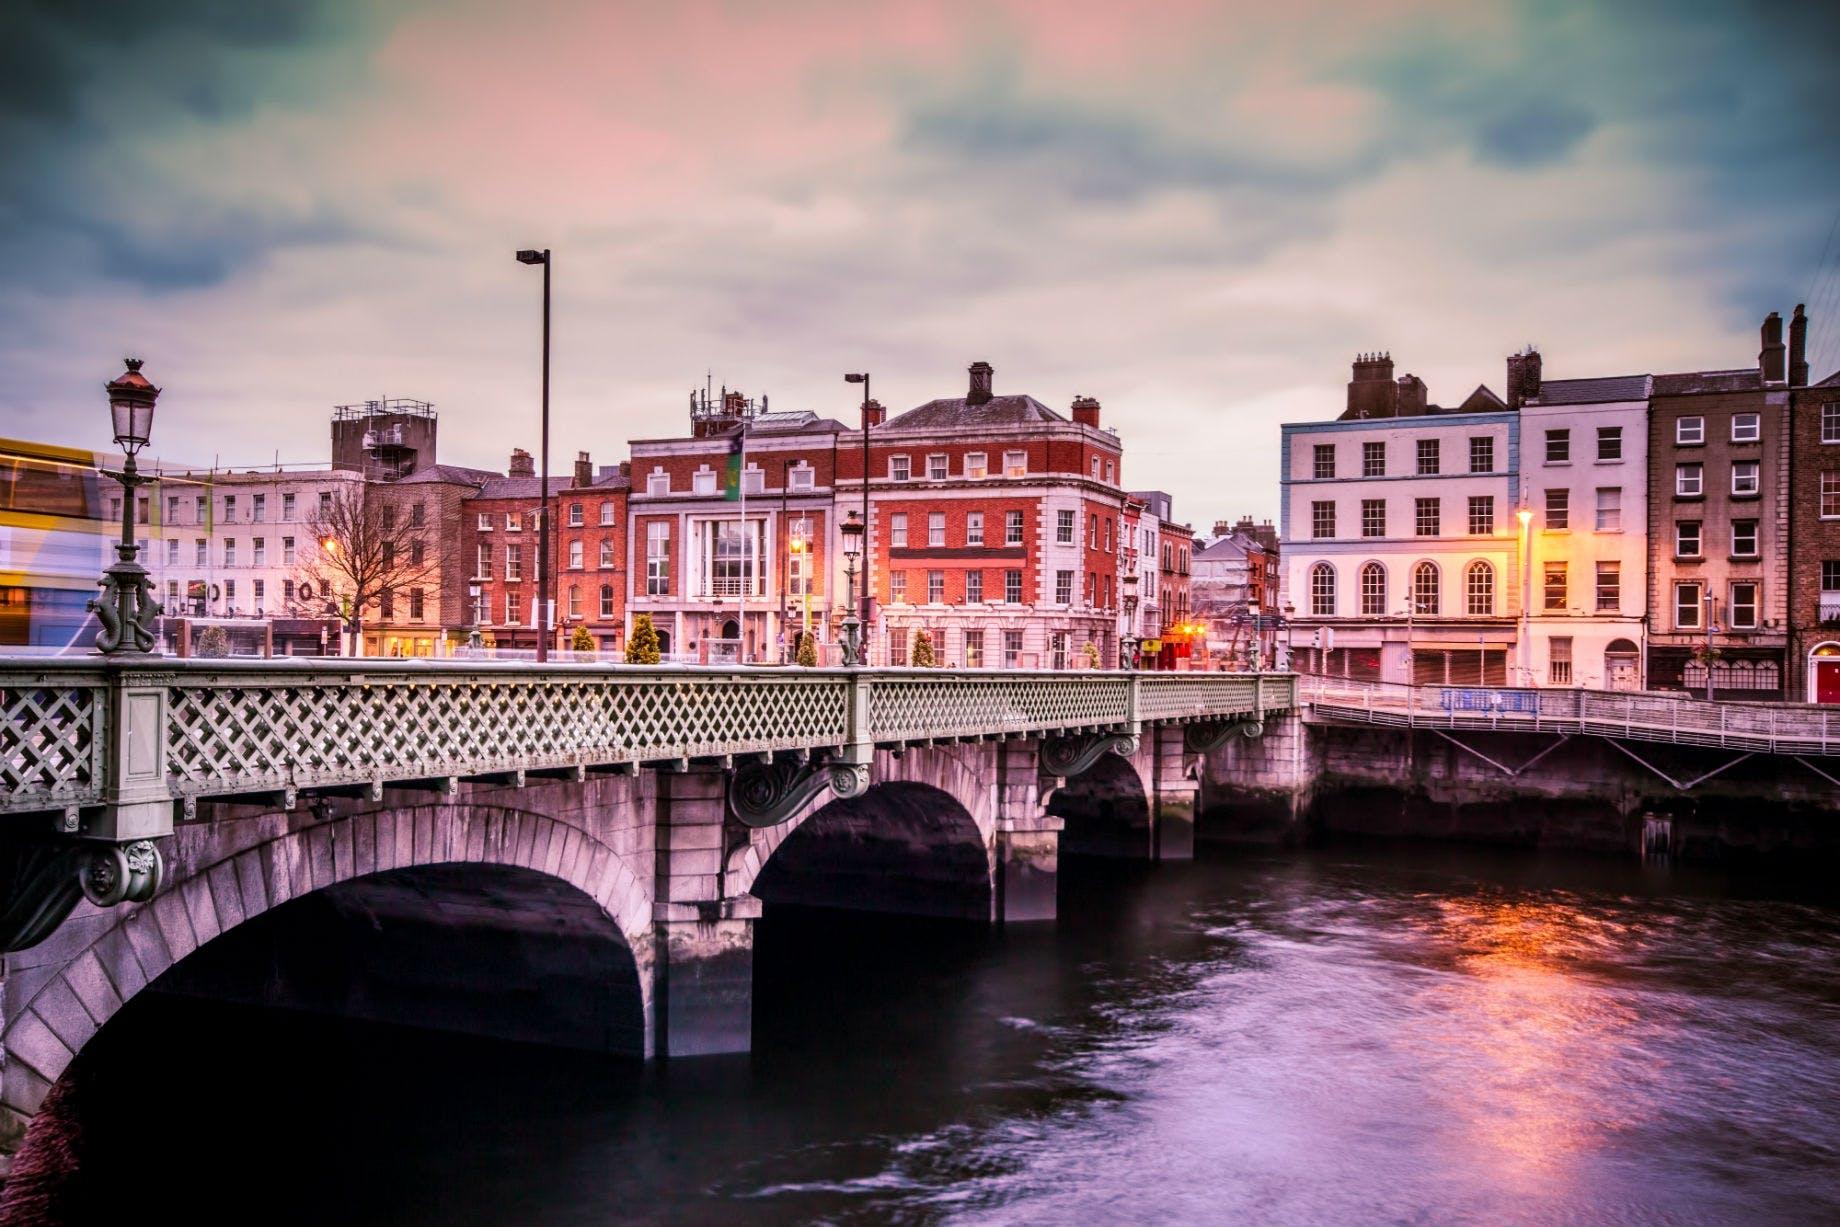 Ver la ciudad,Tour por Dublin,Tour gratuito